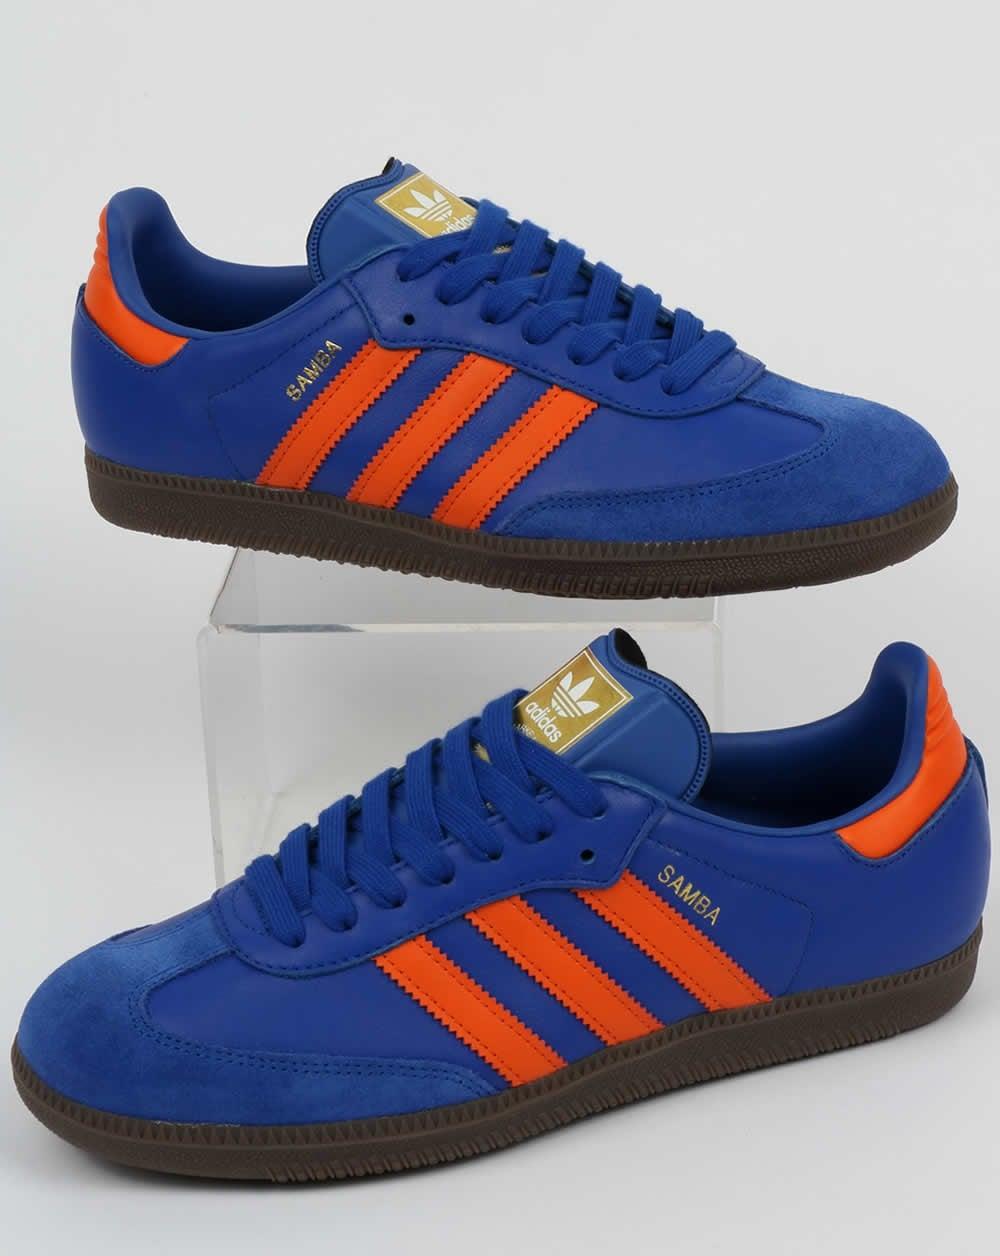 310b34829ce86d adidas Trainers Adidas Samba Trainers Bold Blue Orange